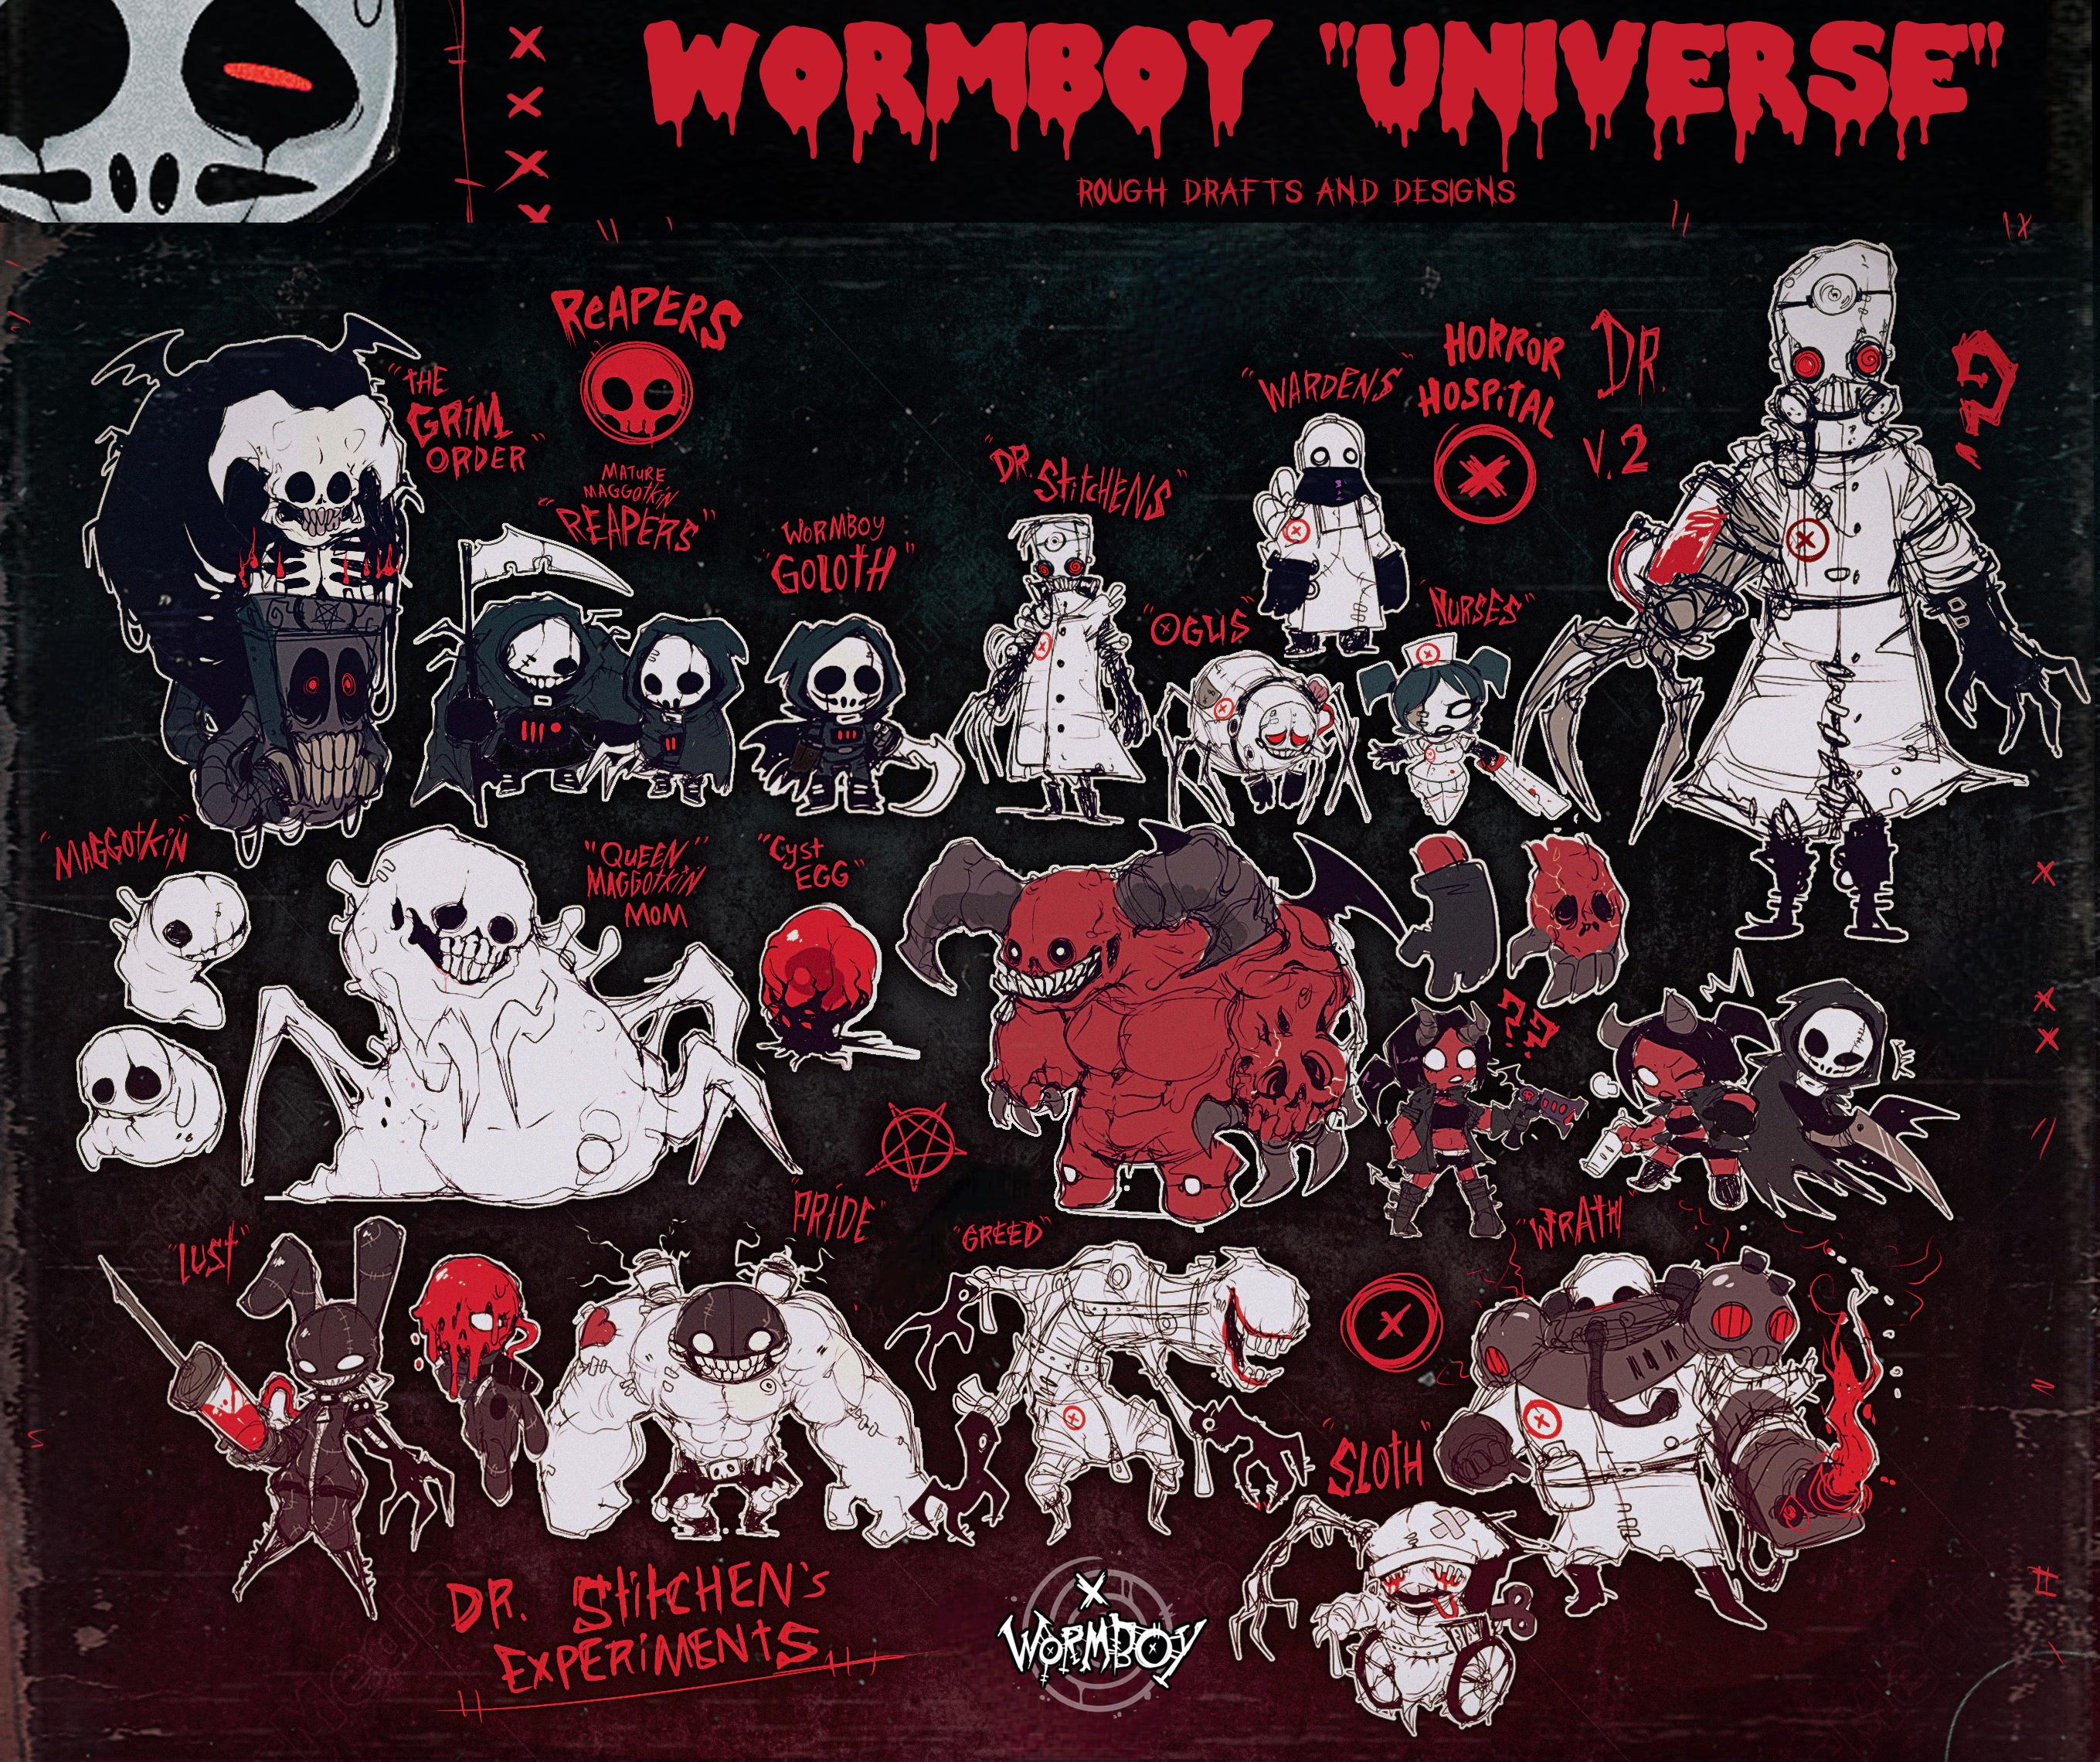 WORMBOY UNIVERSE SCREAM-MATICS (2020) by WORMBOYx on DeviantArt